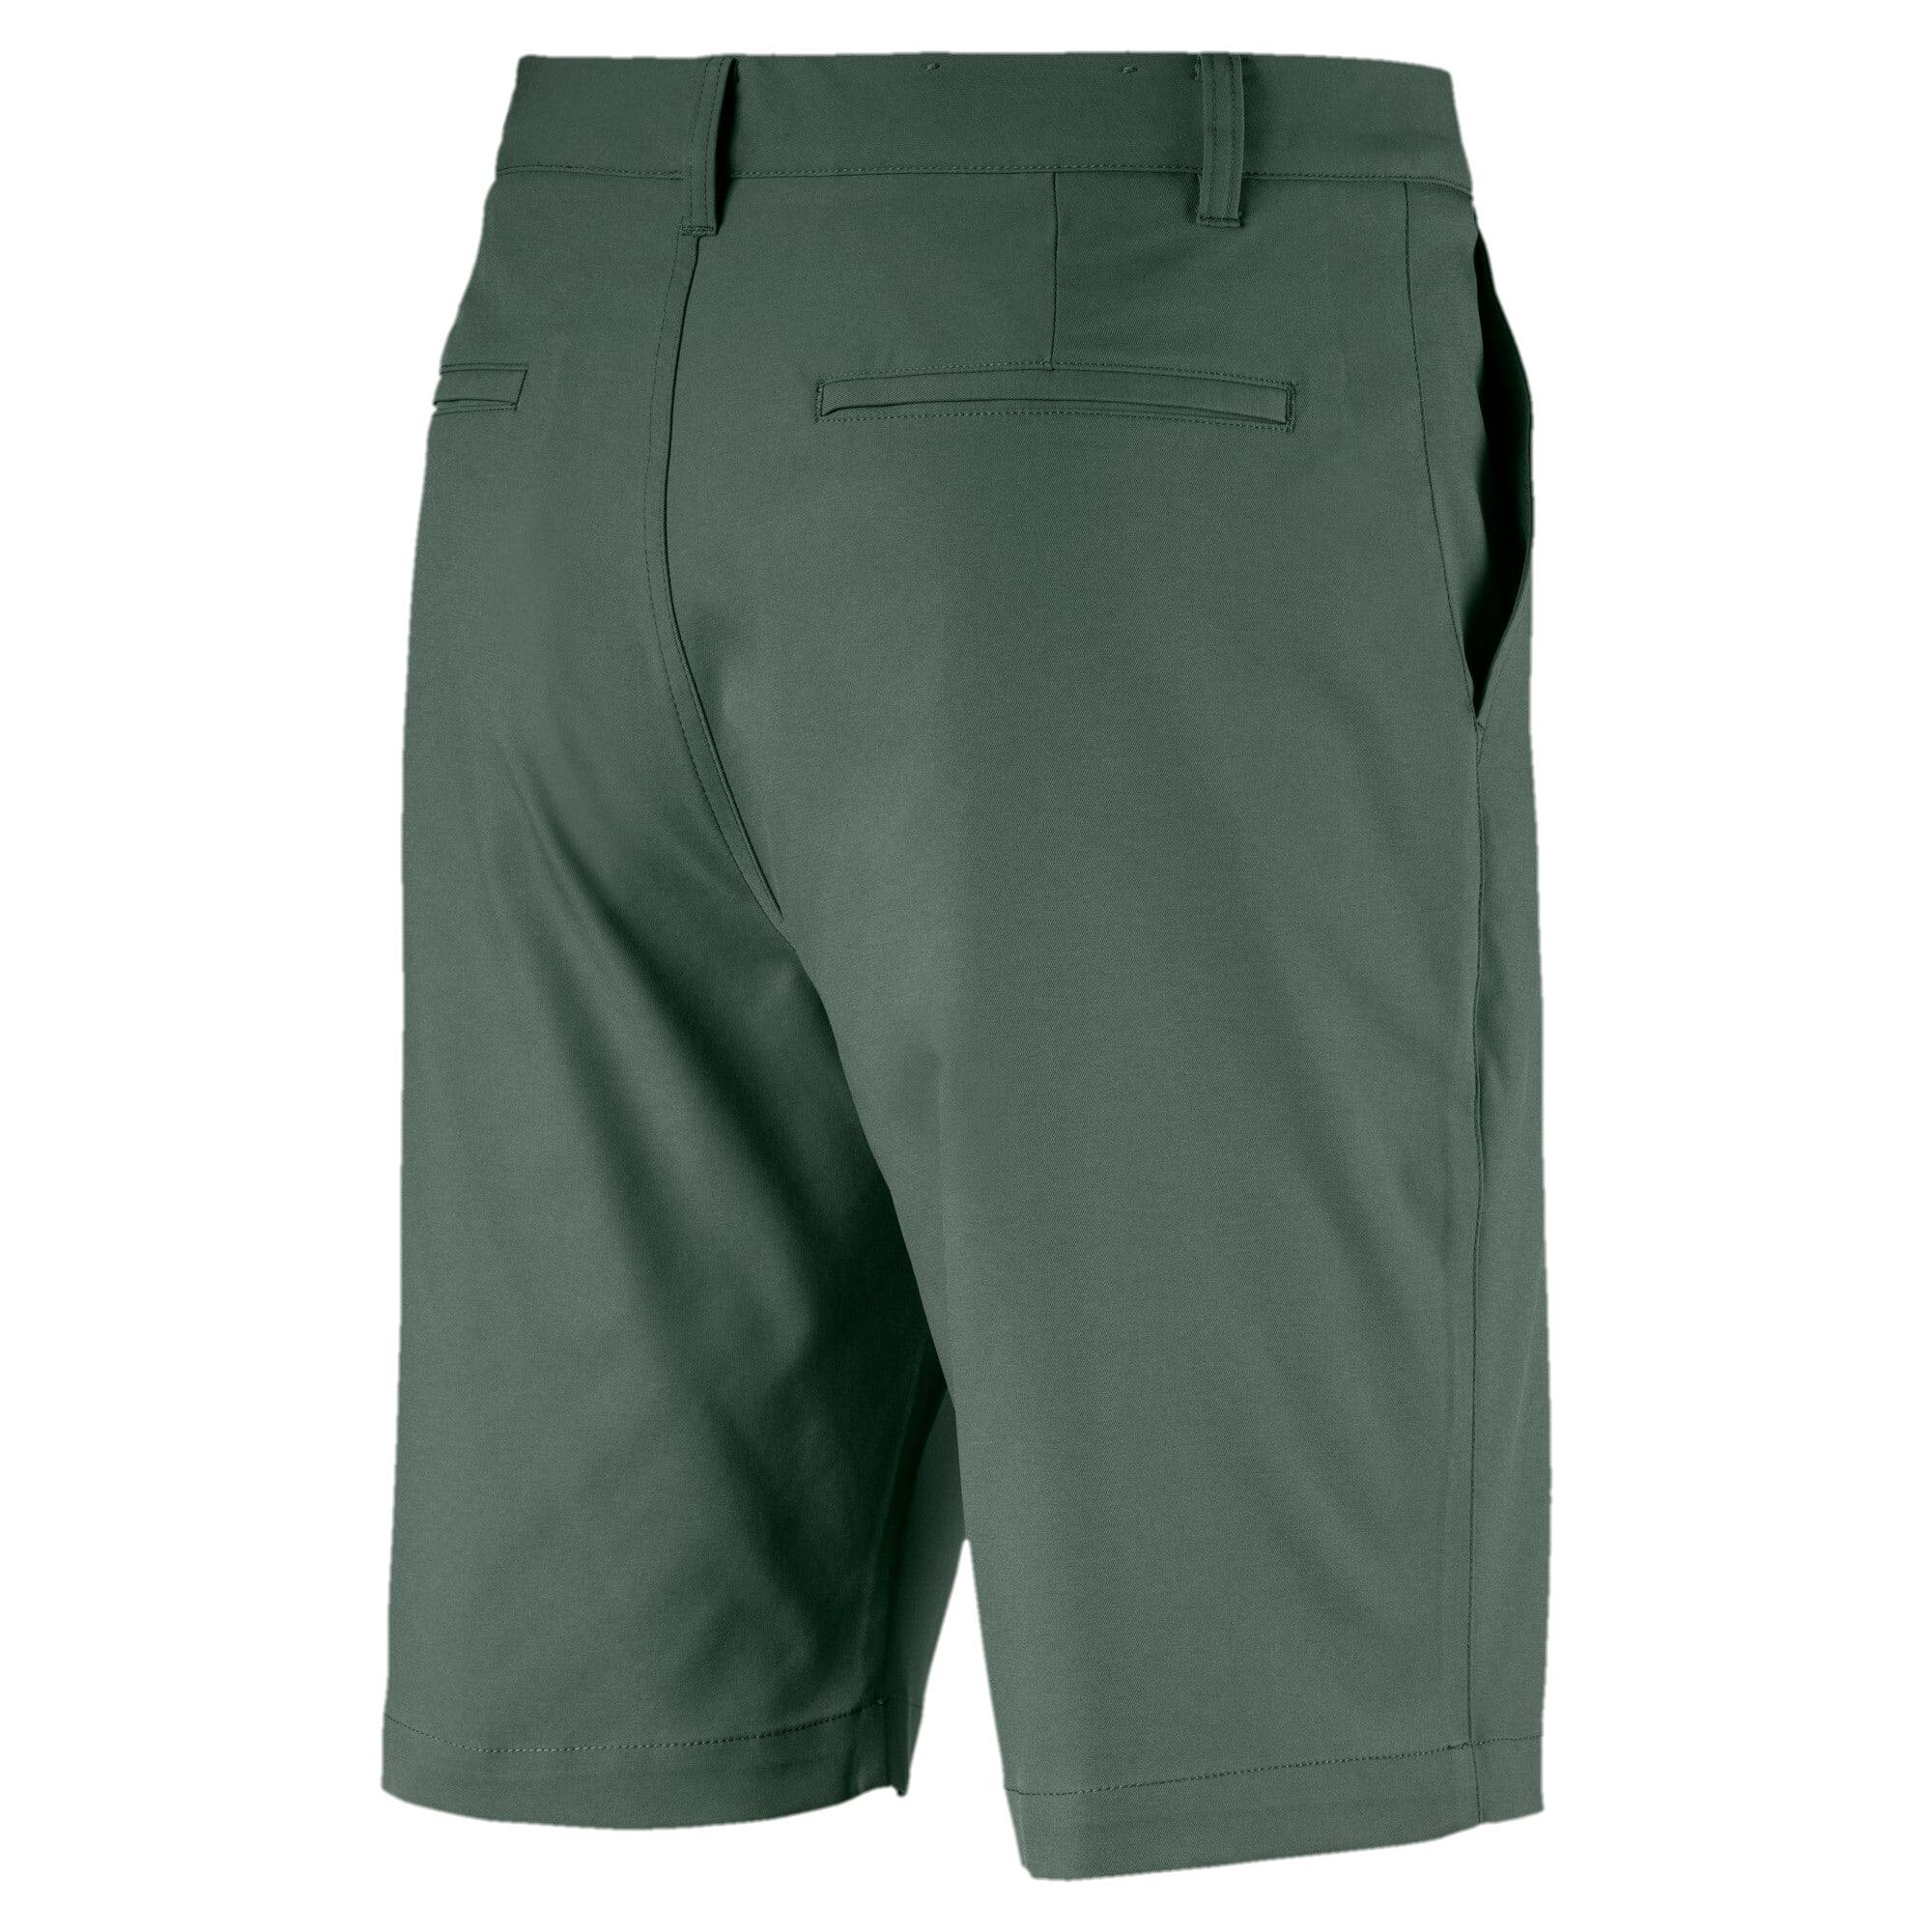 Thumbnail 2 of Men's Essential Pounce Shorts, Laurel Wreath, medium